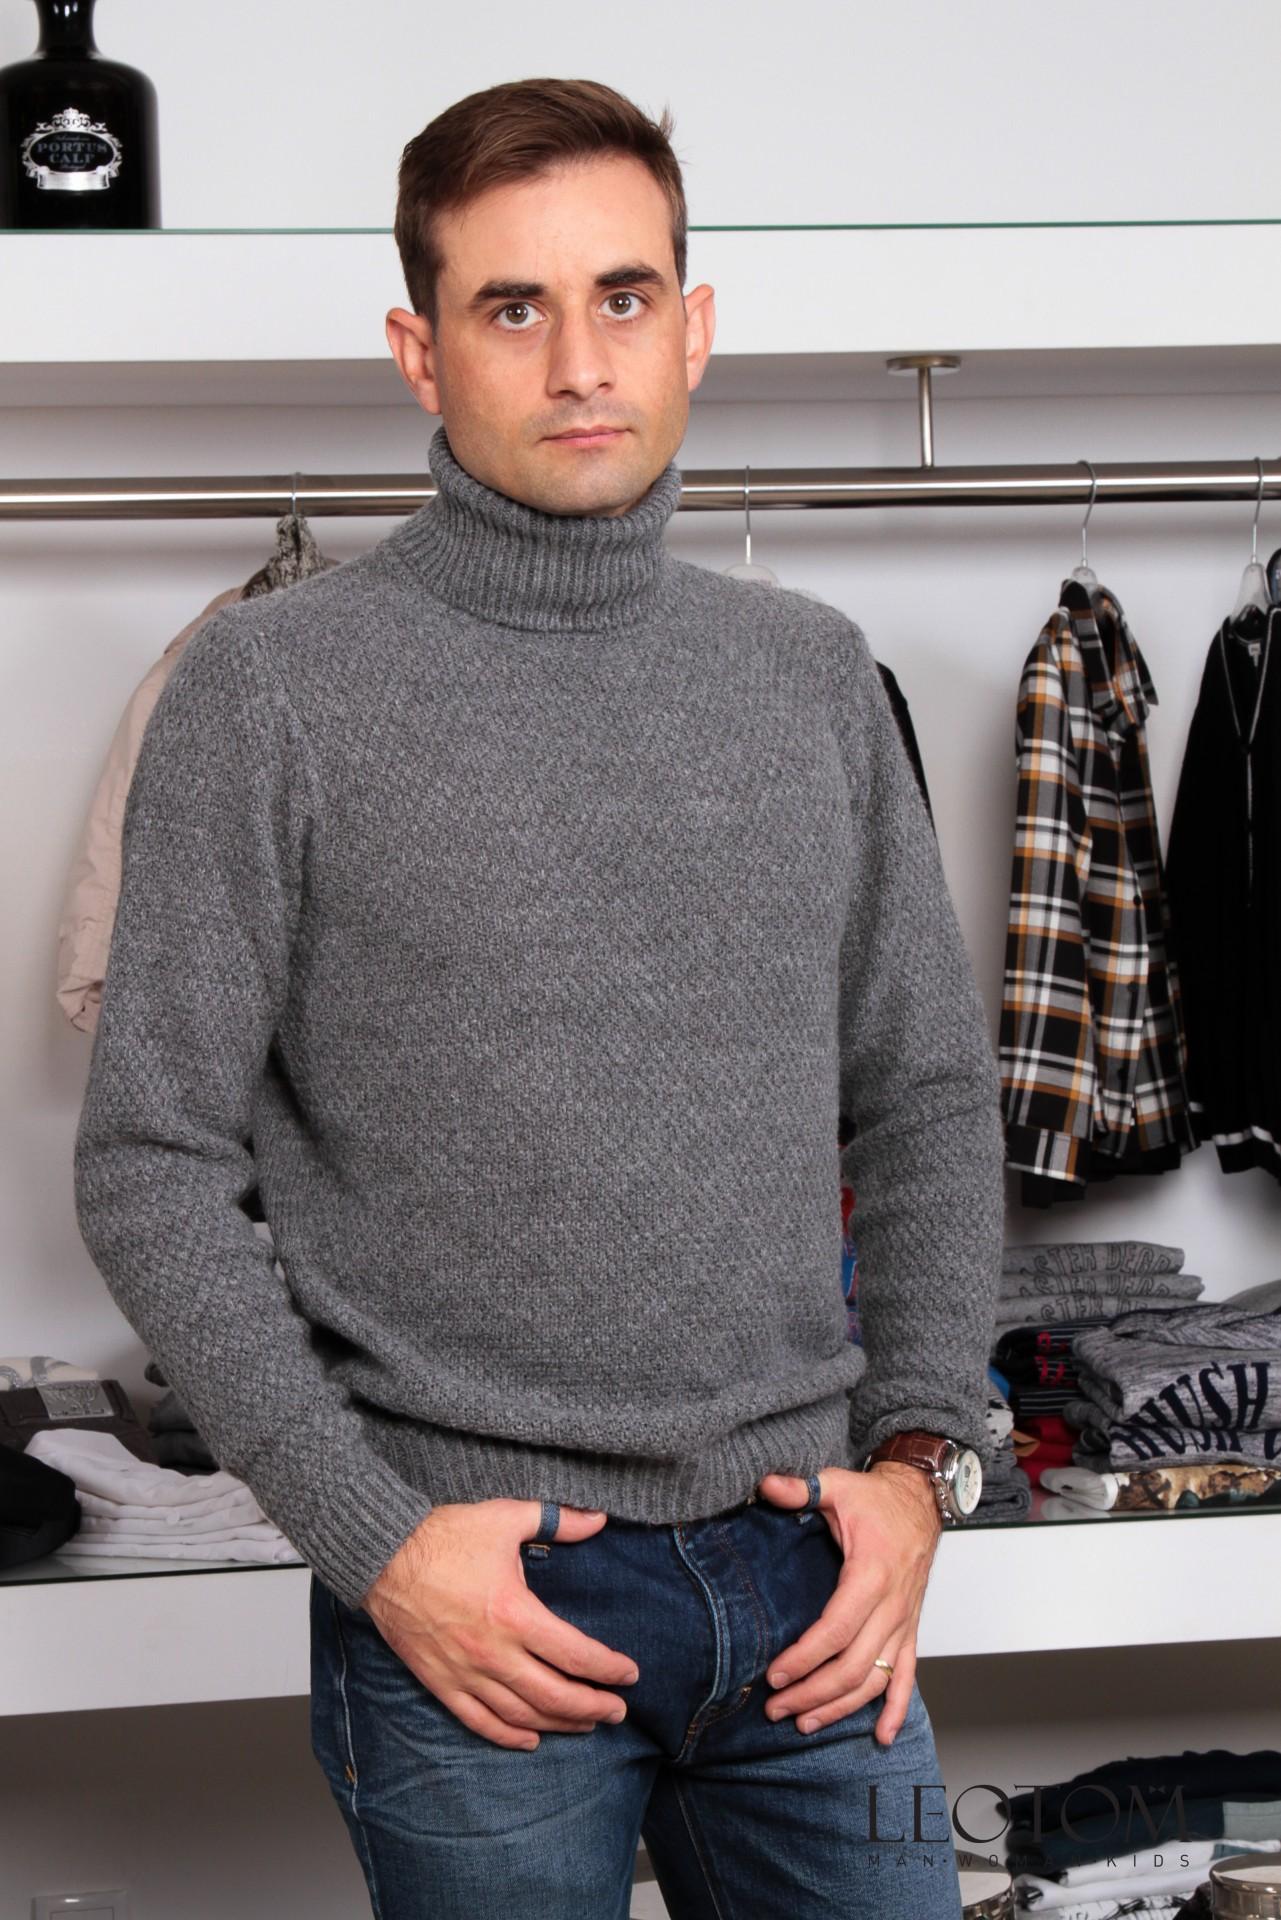 Camisola gola alta masculina cinza Individual